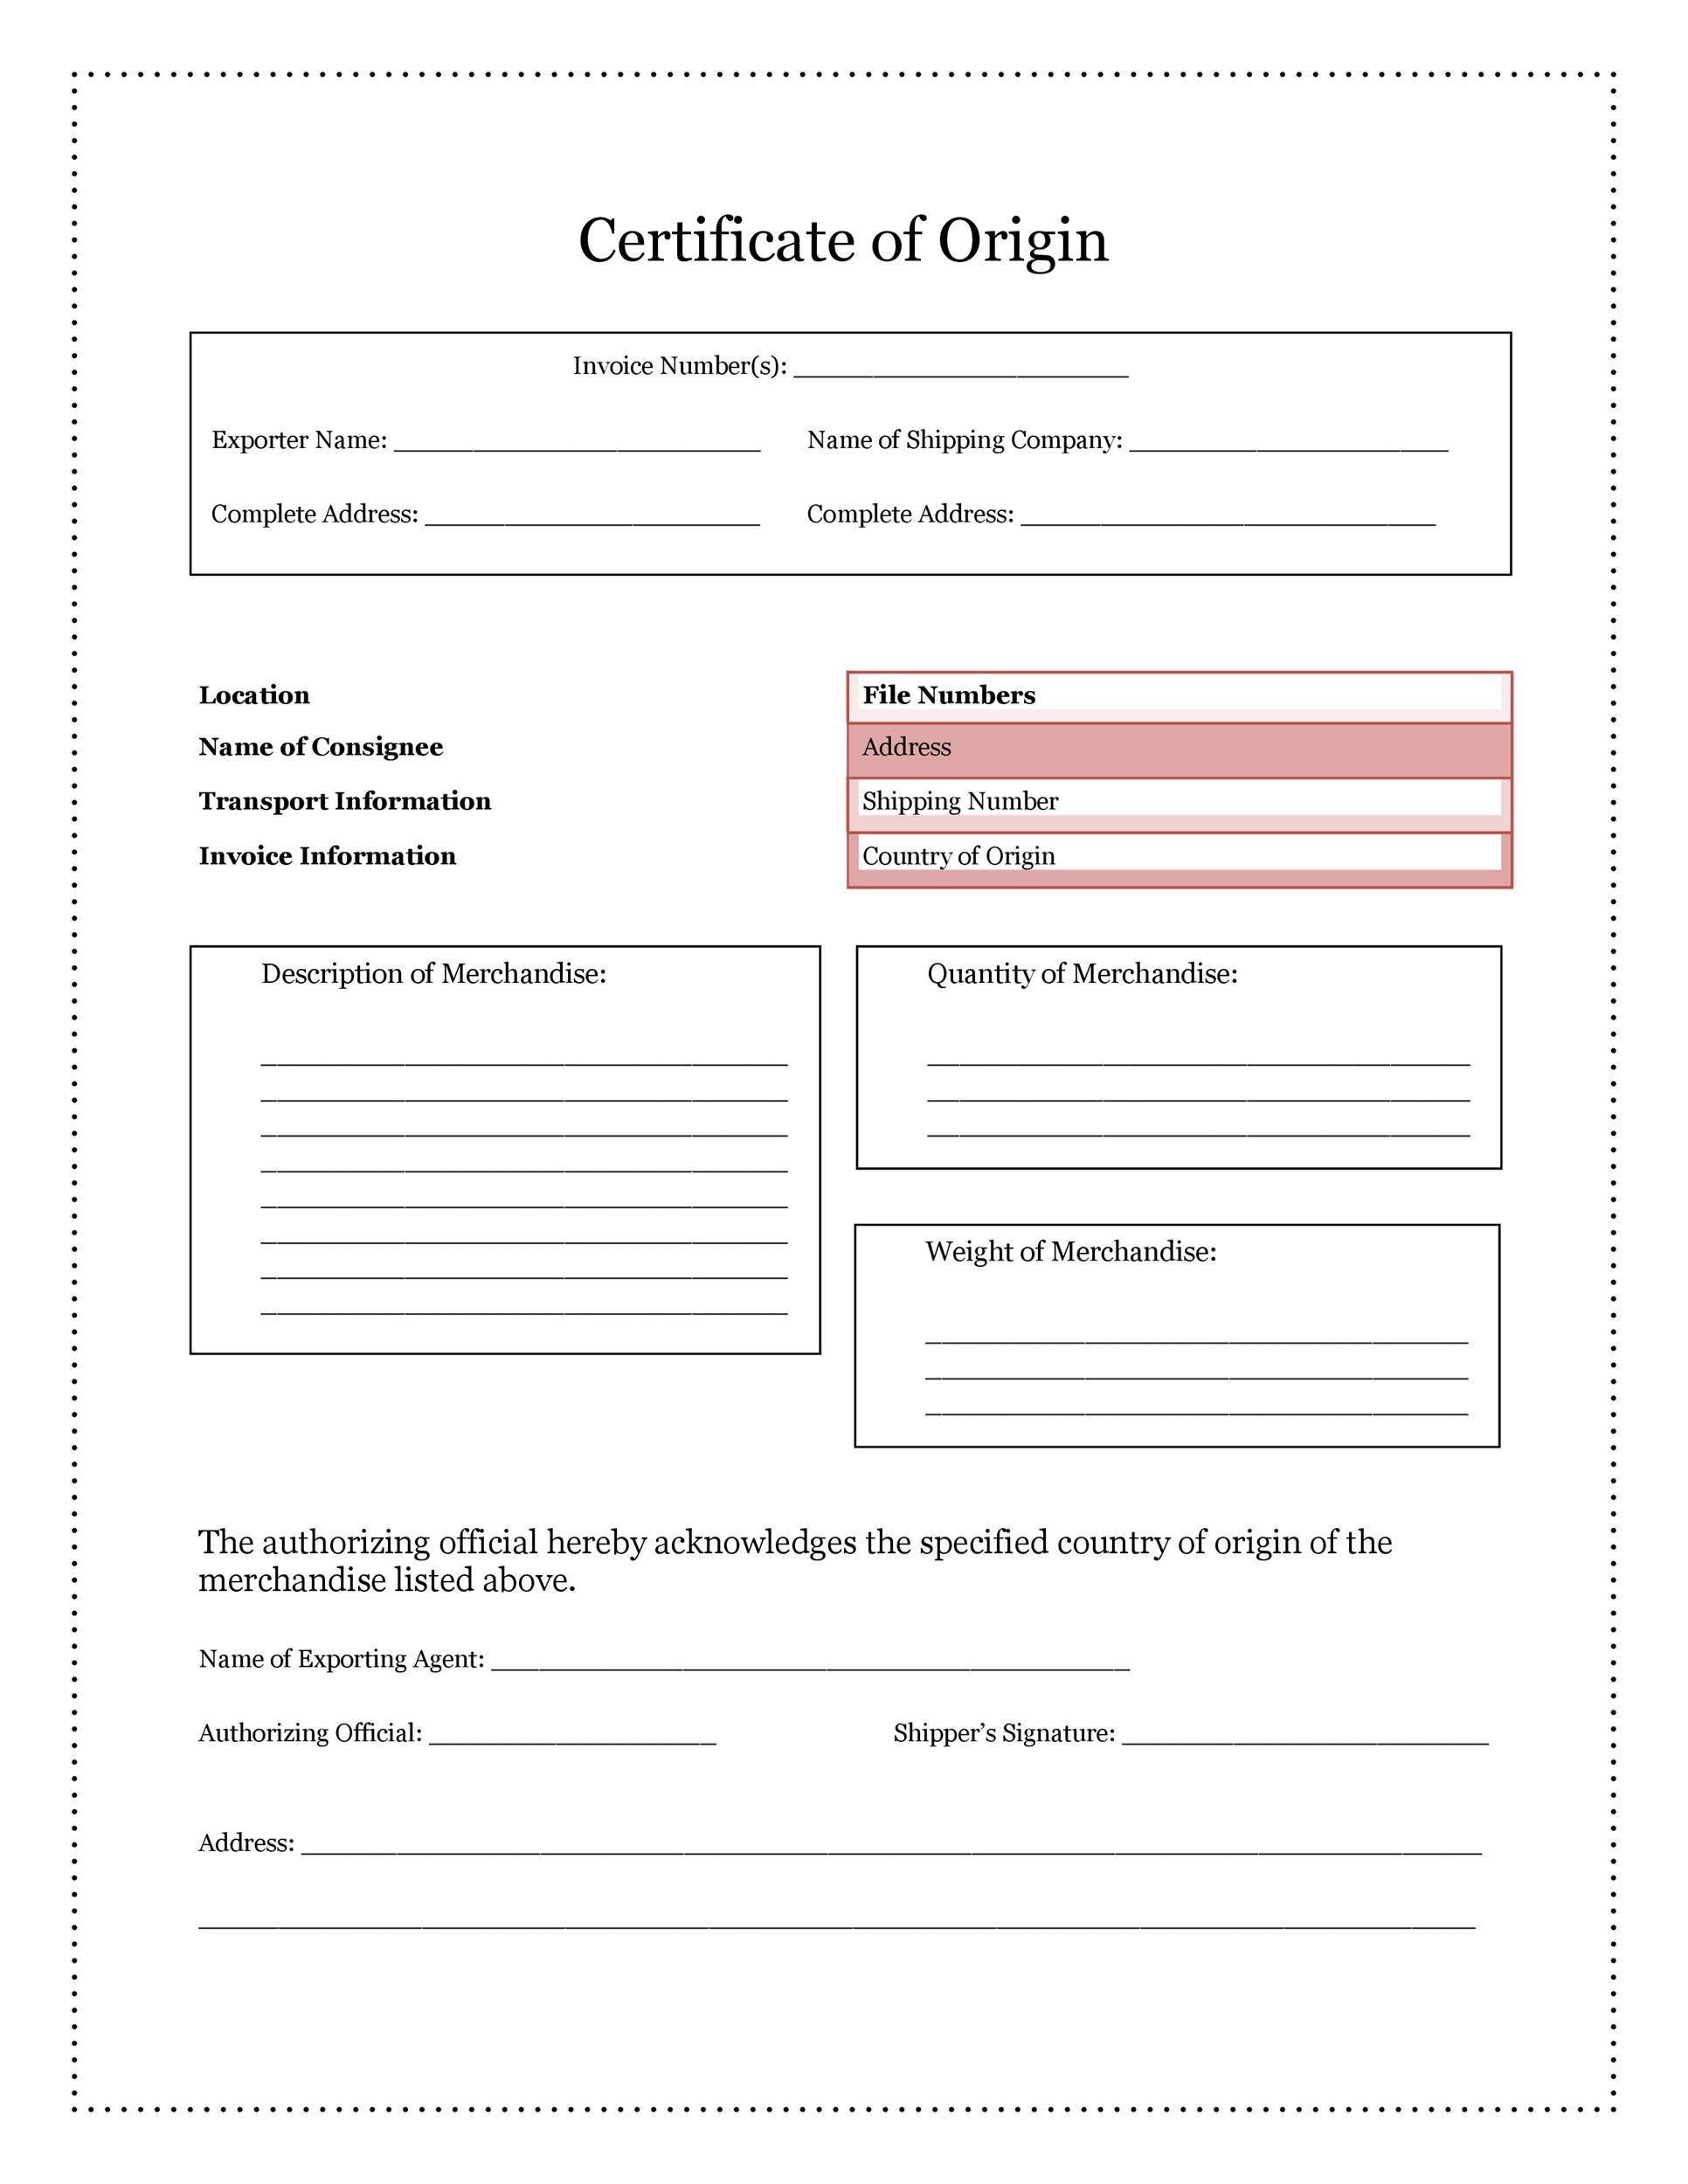 Free certificate of origin 10